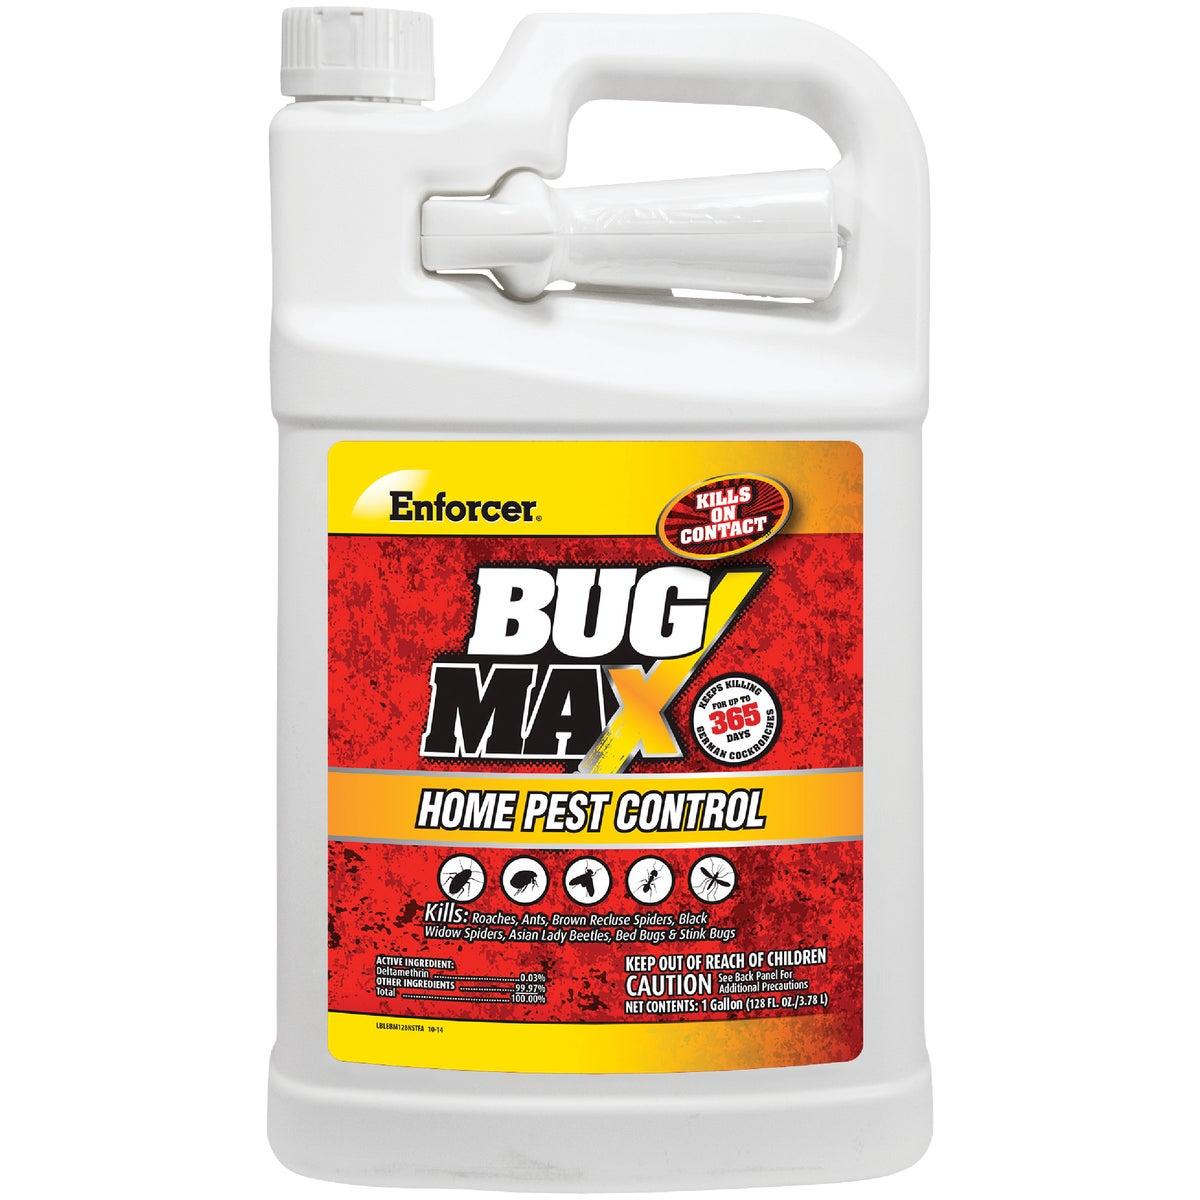 ZEP EBM128 Home Pest Control, 1-Gallon